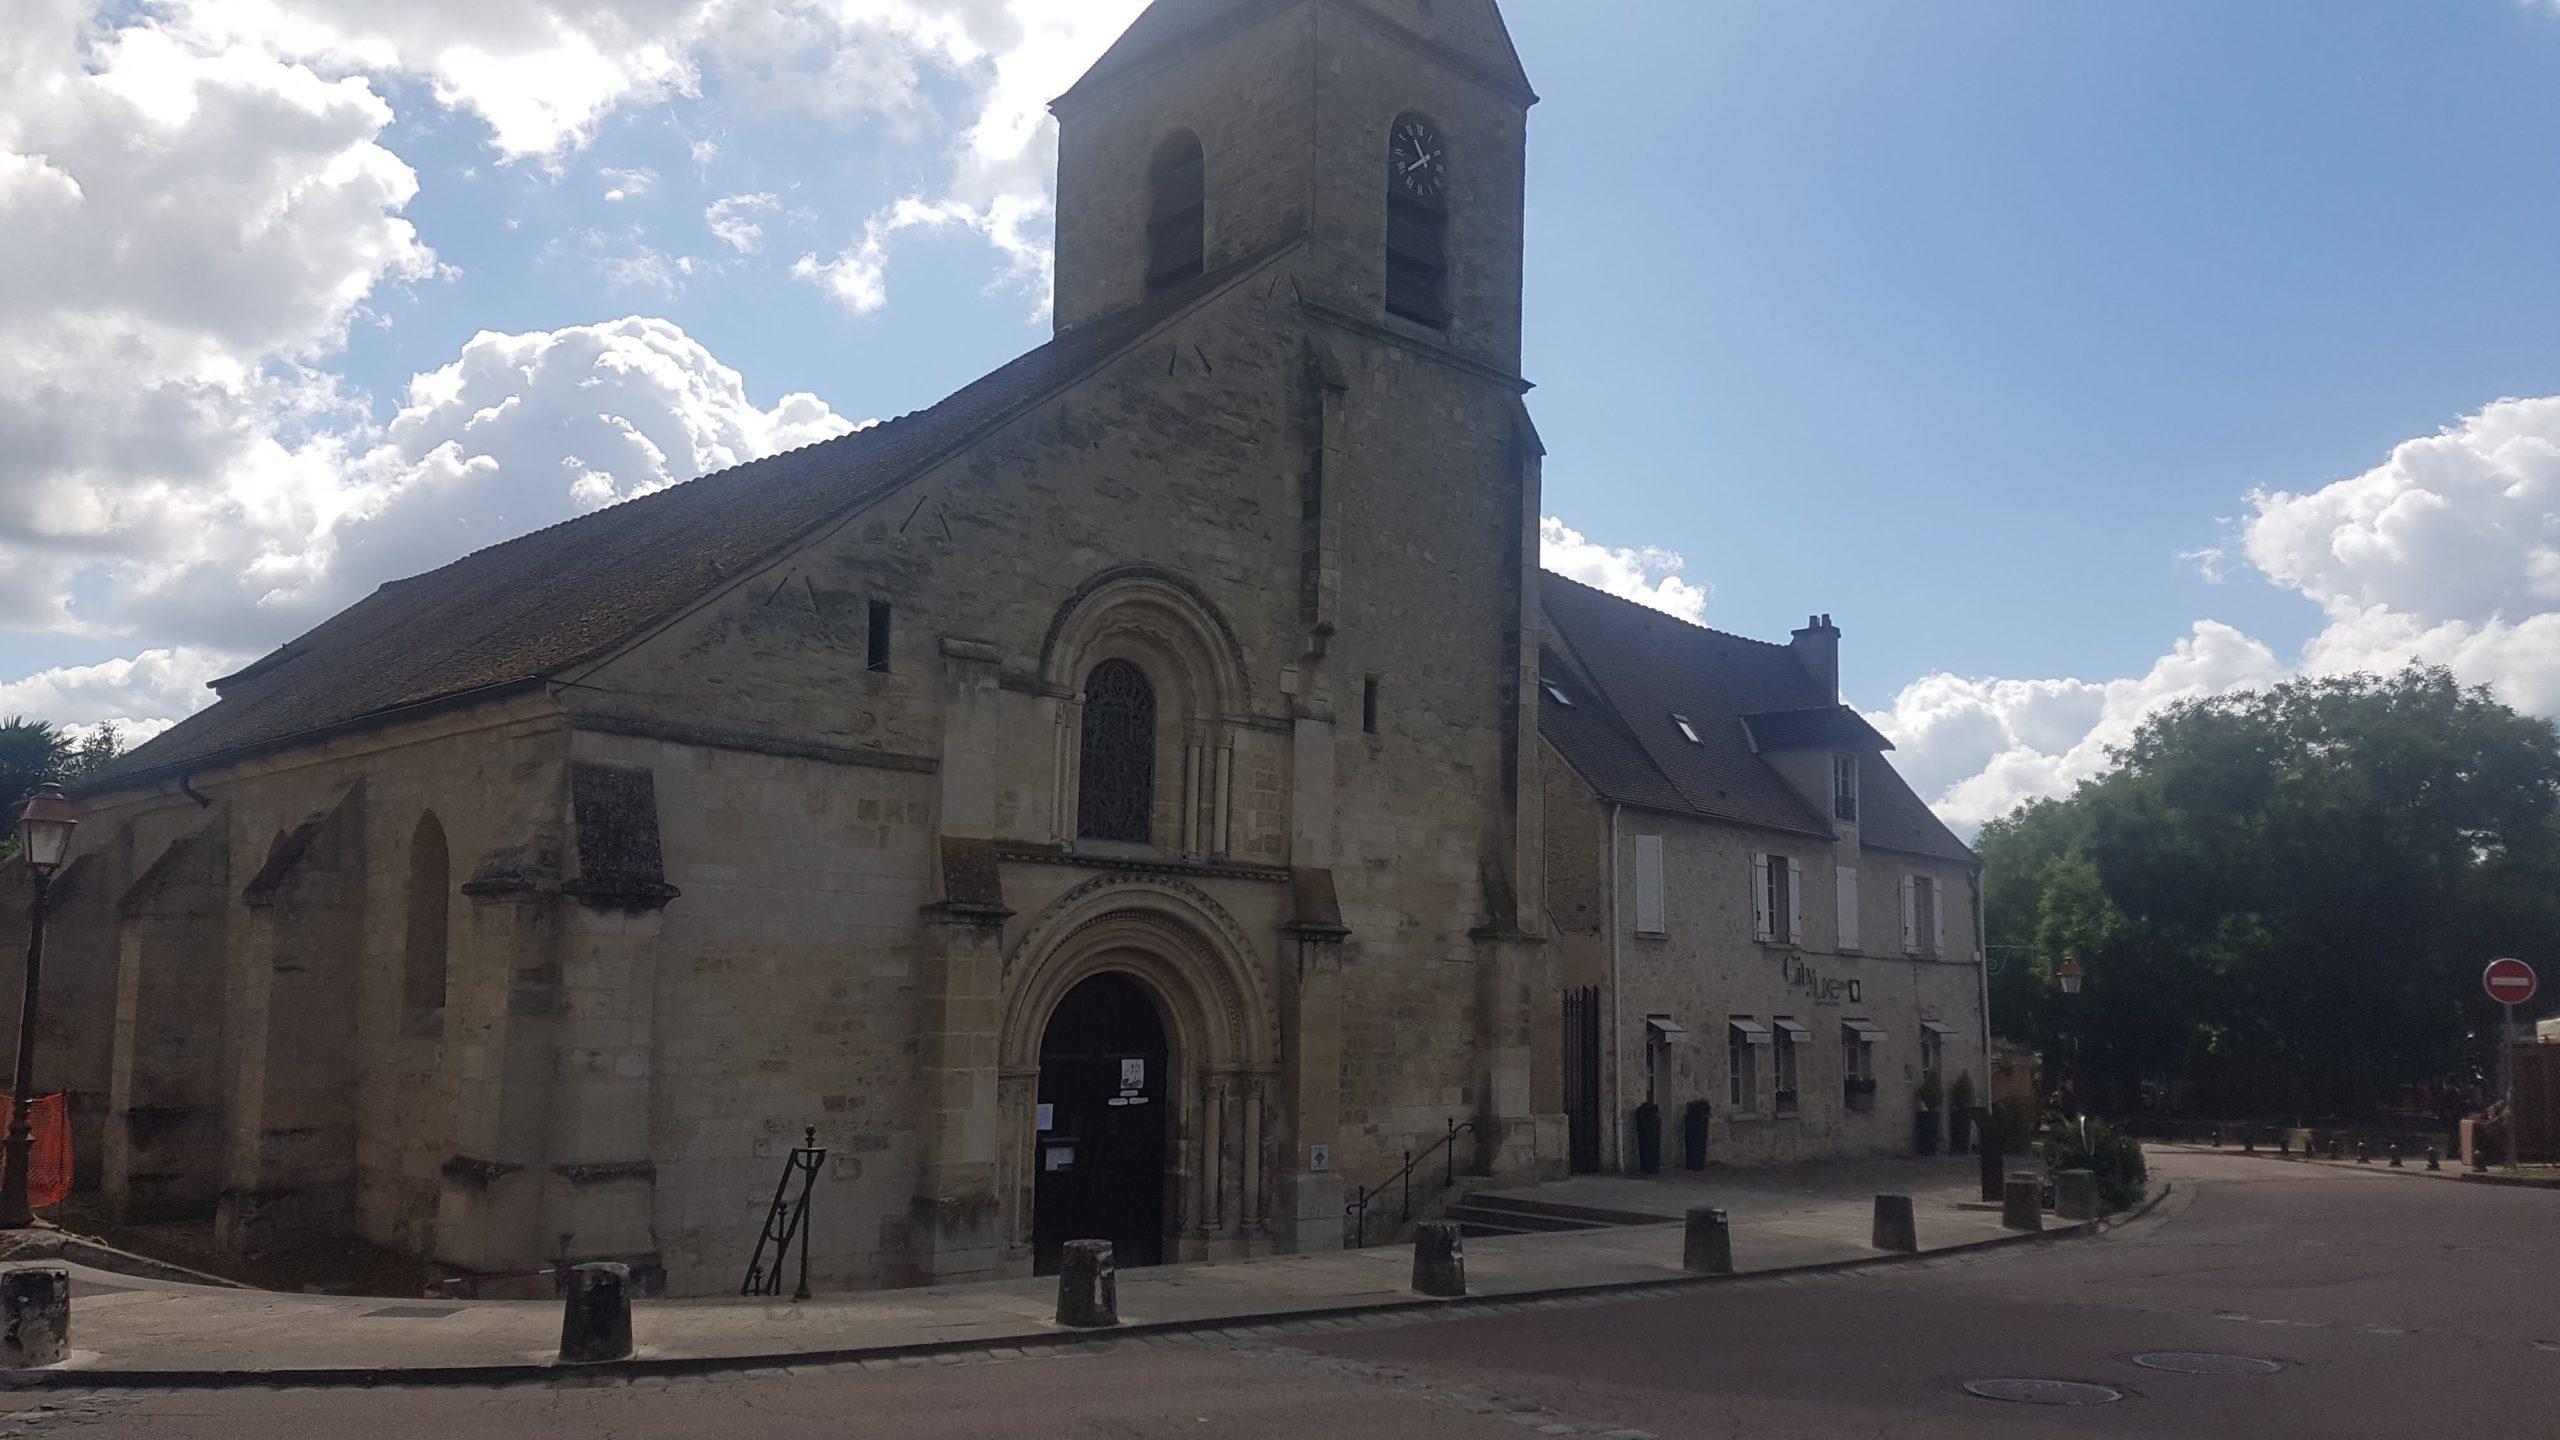 Eglise Villennes sur Seine